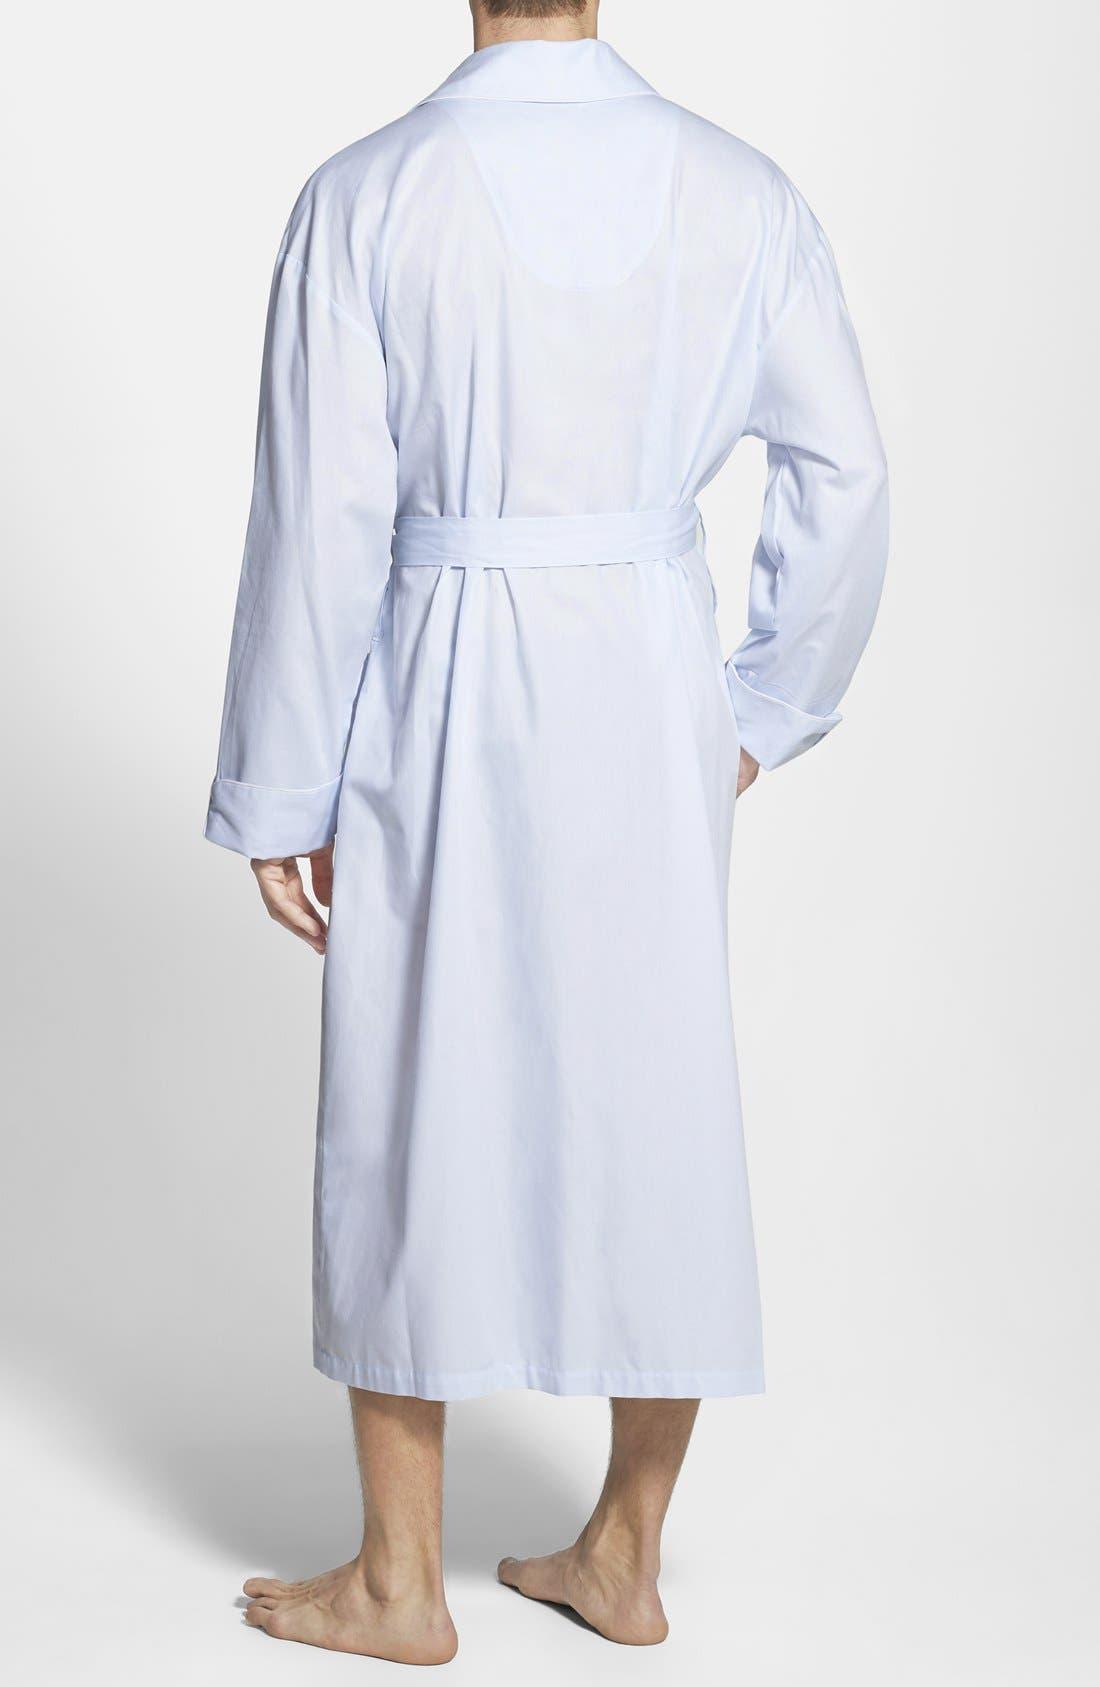 MAJESTIC INTERNATIONAL,                             'Signature' Cotton Robe,                             Alternate thumbnail 5, color,                             SURF